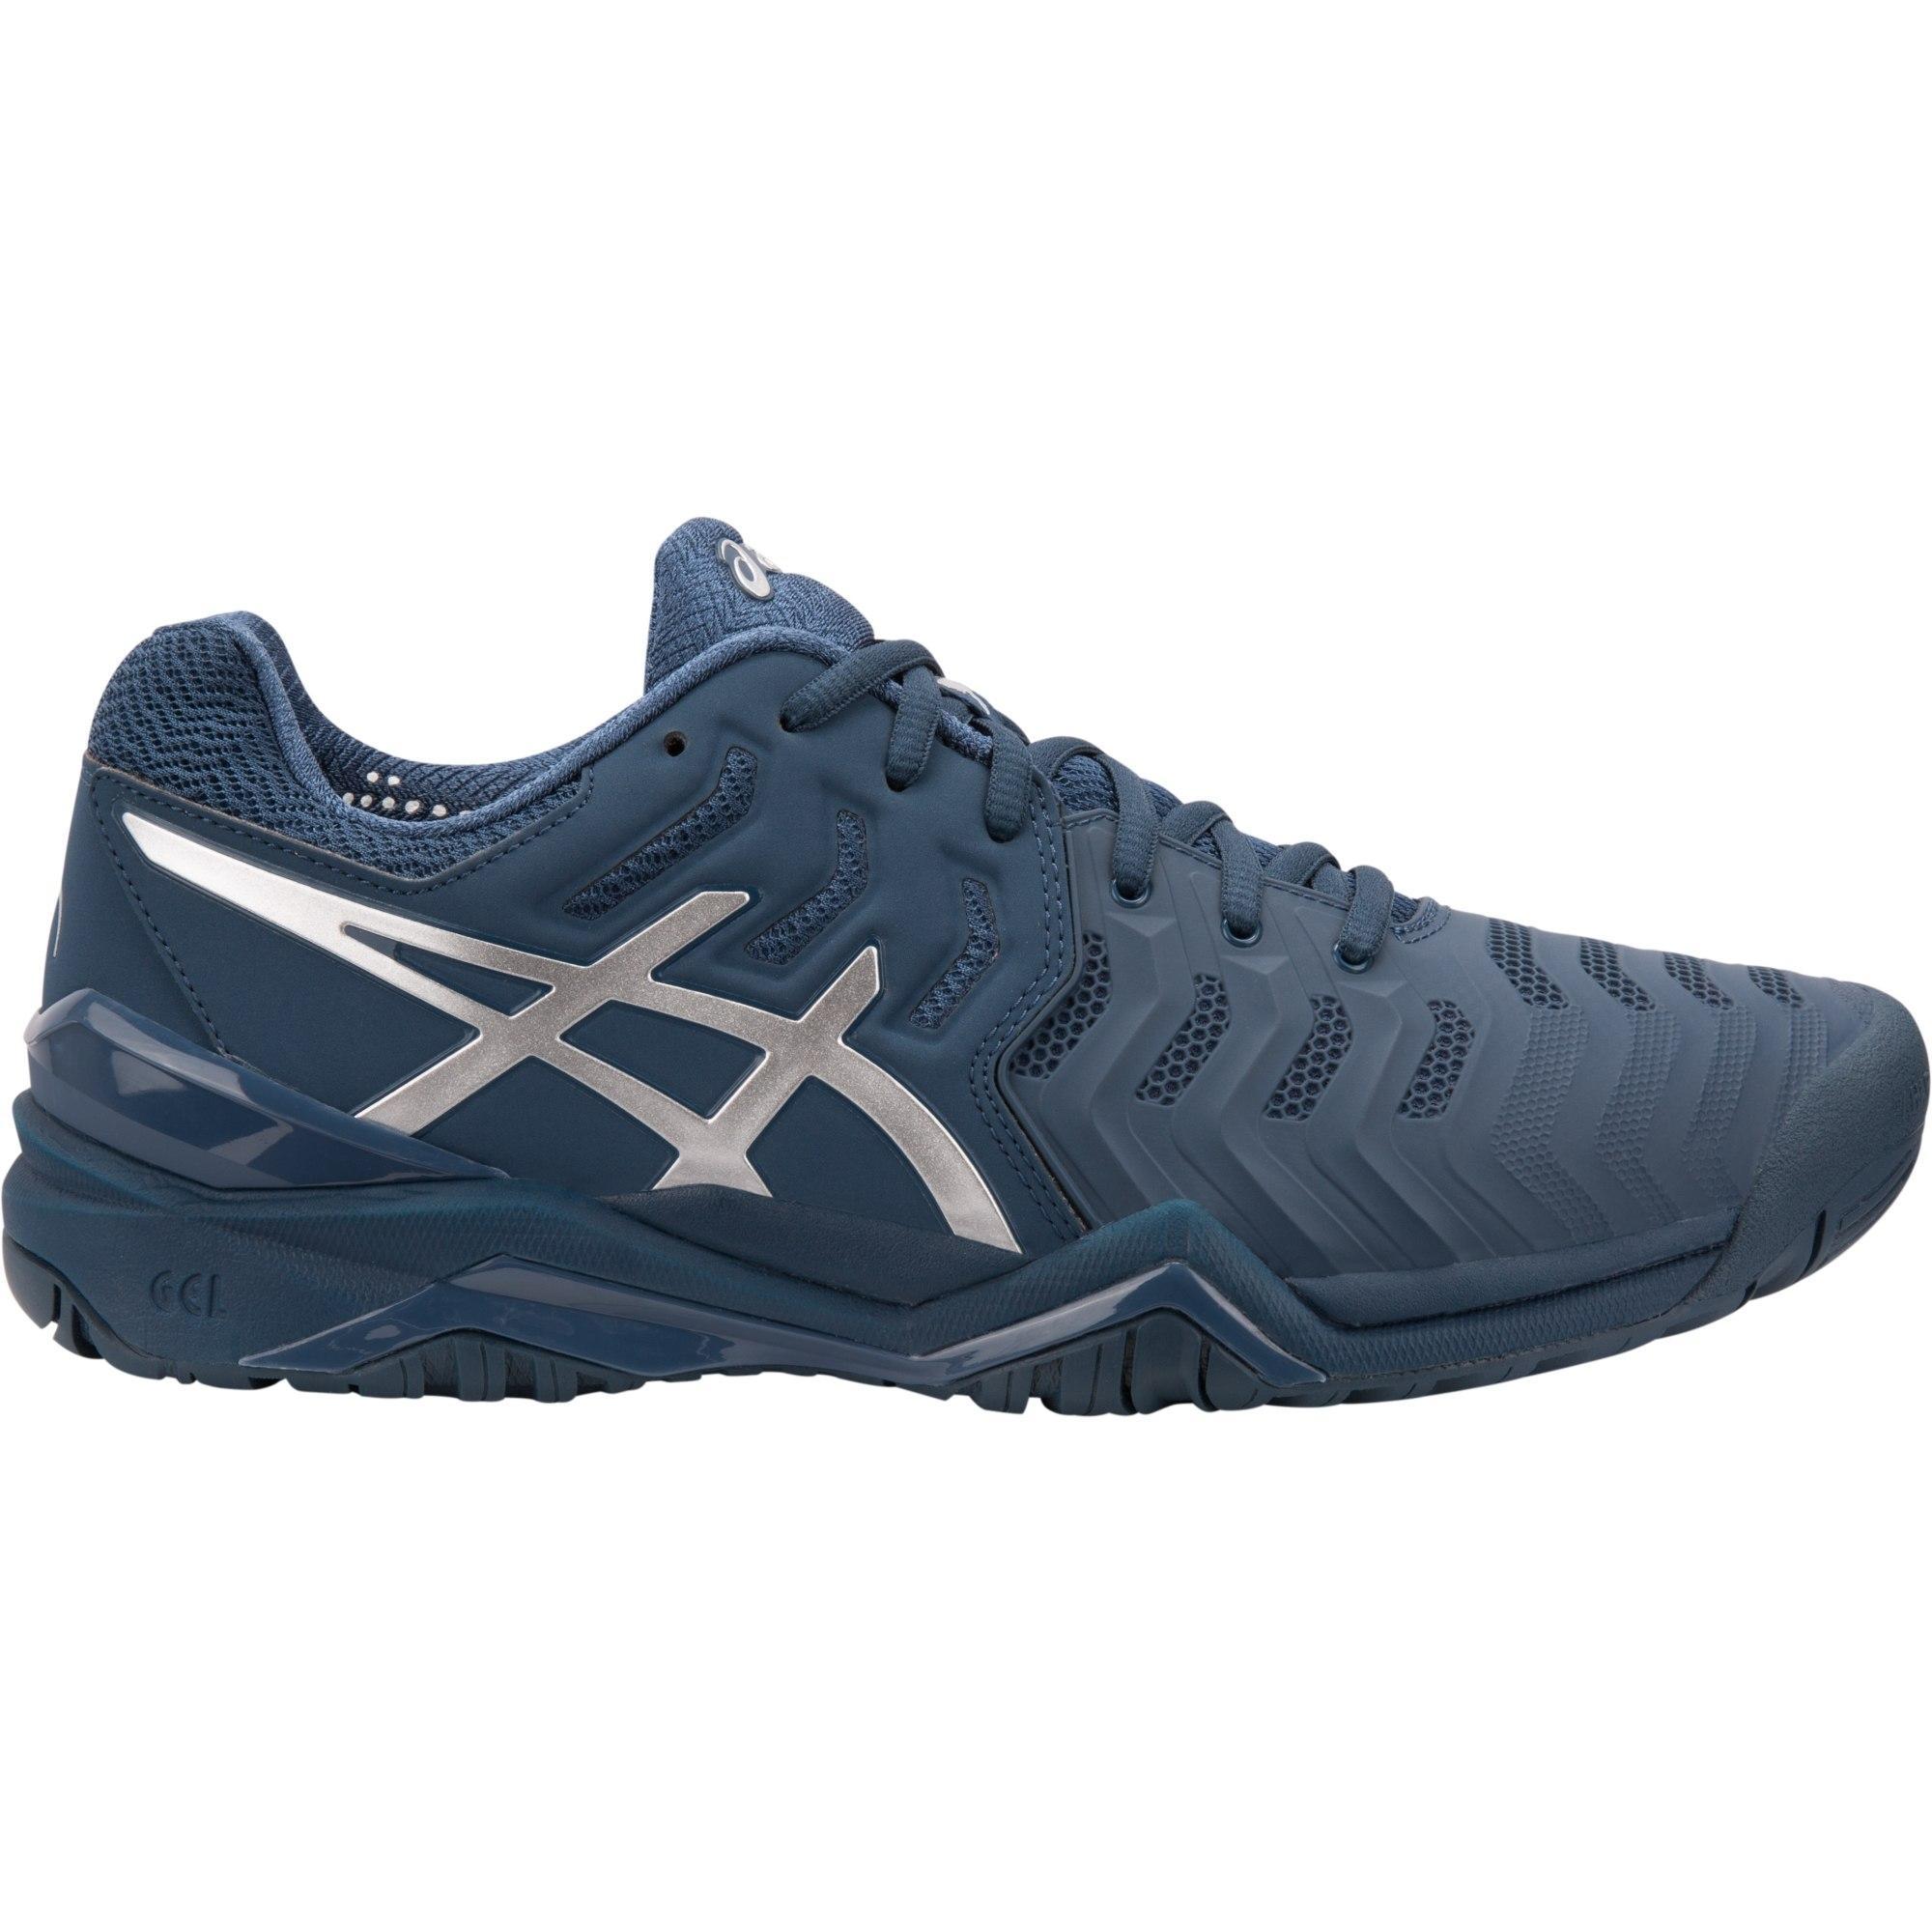 Asics Mens GEL-Resolution Novak Tennis Shoes - Peacoat Silver -  Tennisnuts.com e7a76353c0ff